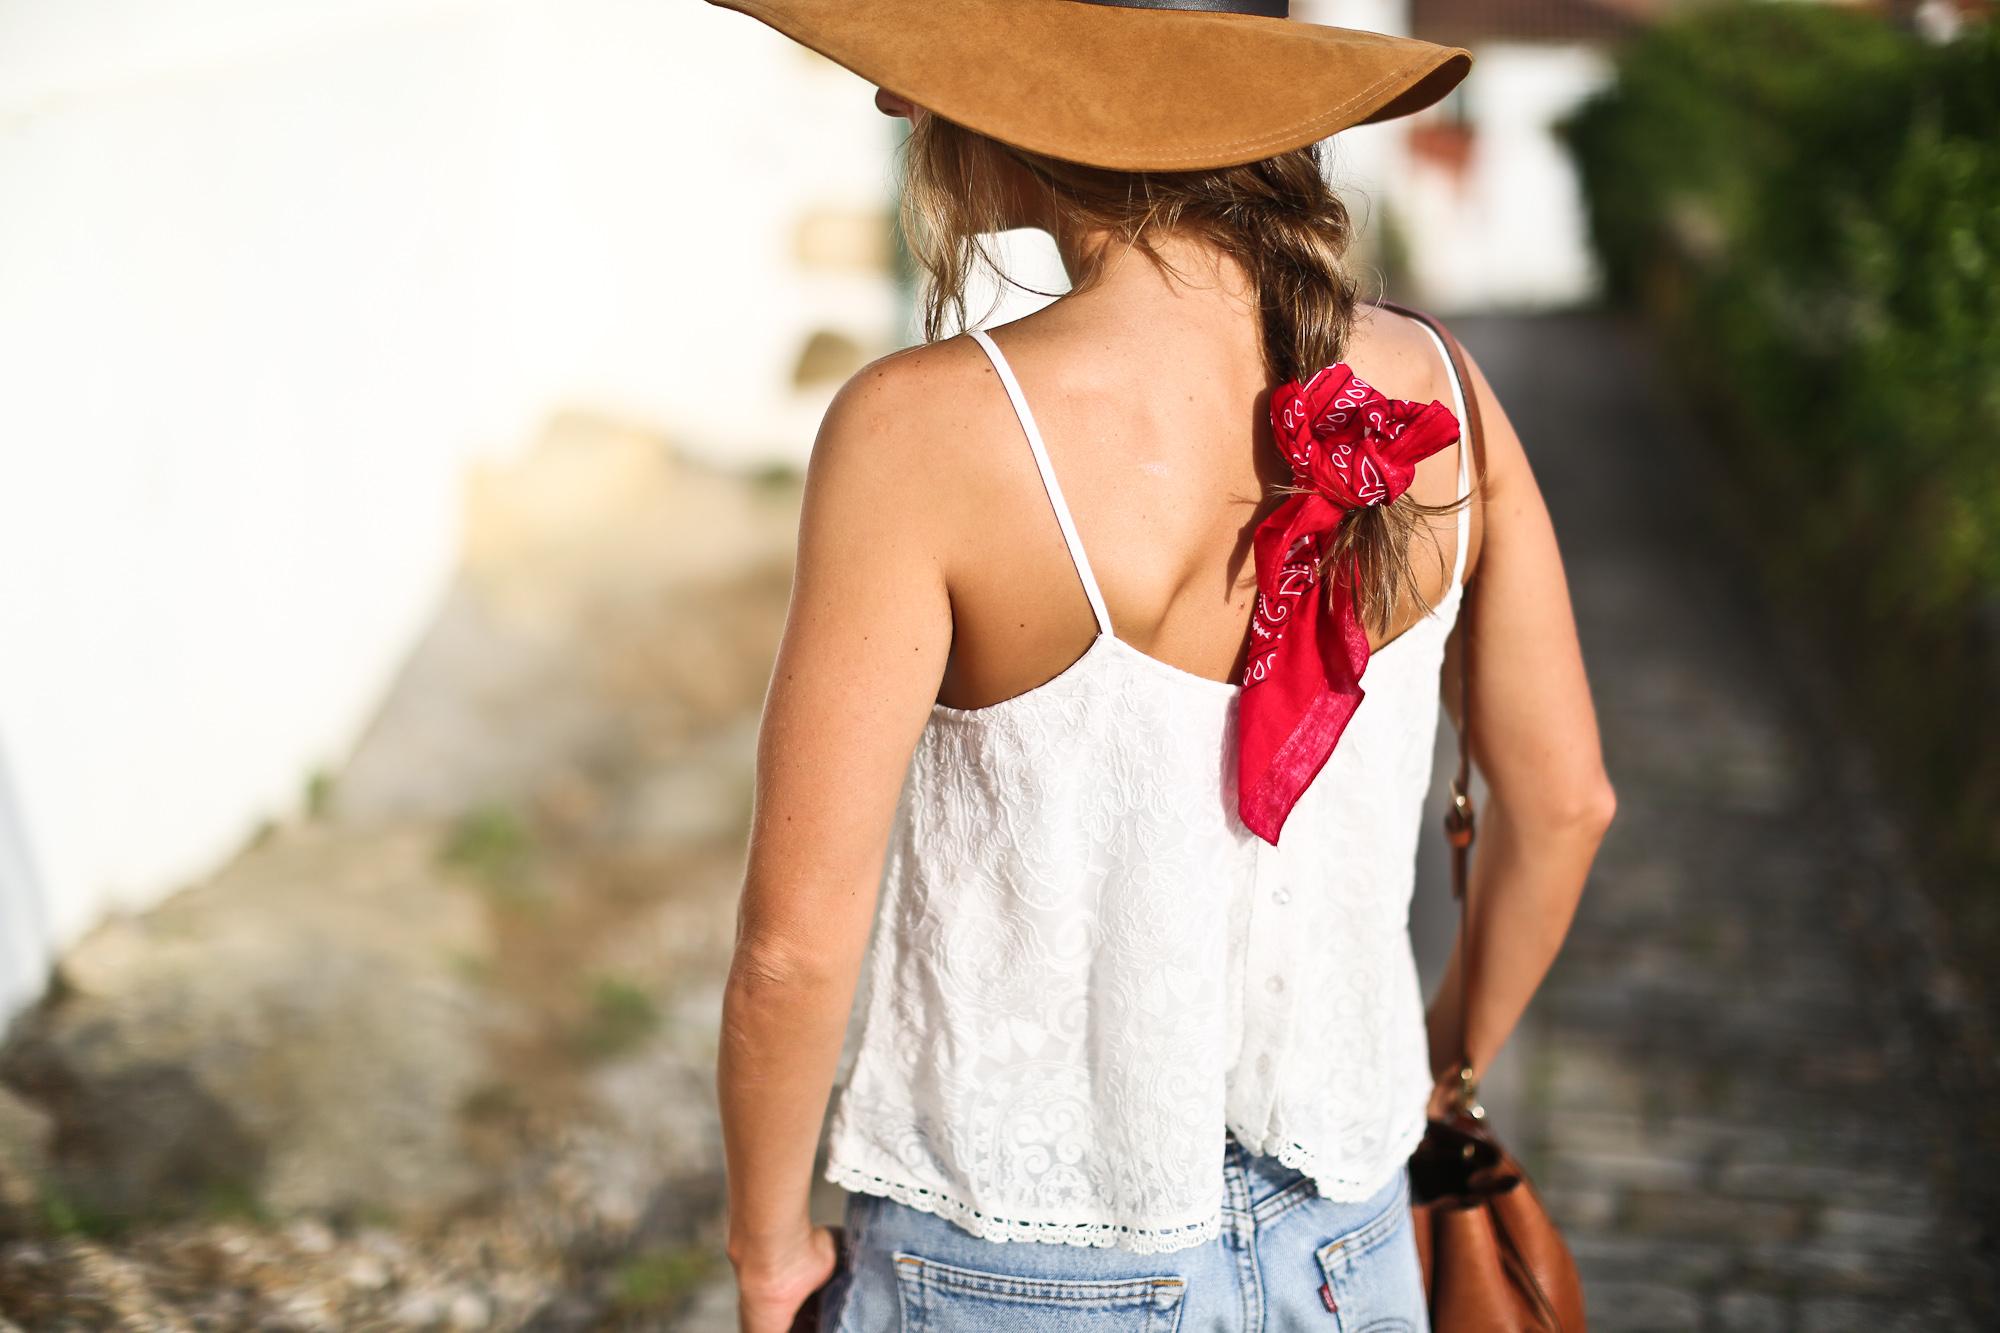 Clochet_streetstyle_levis_501_vintage_shorts_leather_fedora_hat-3